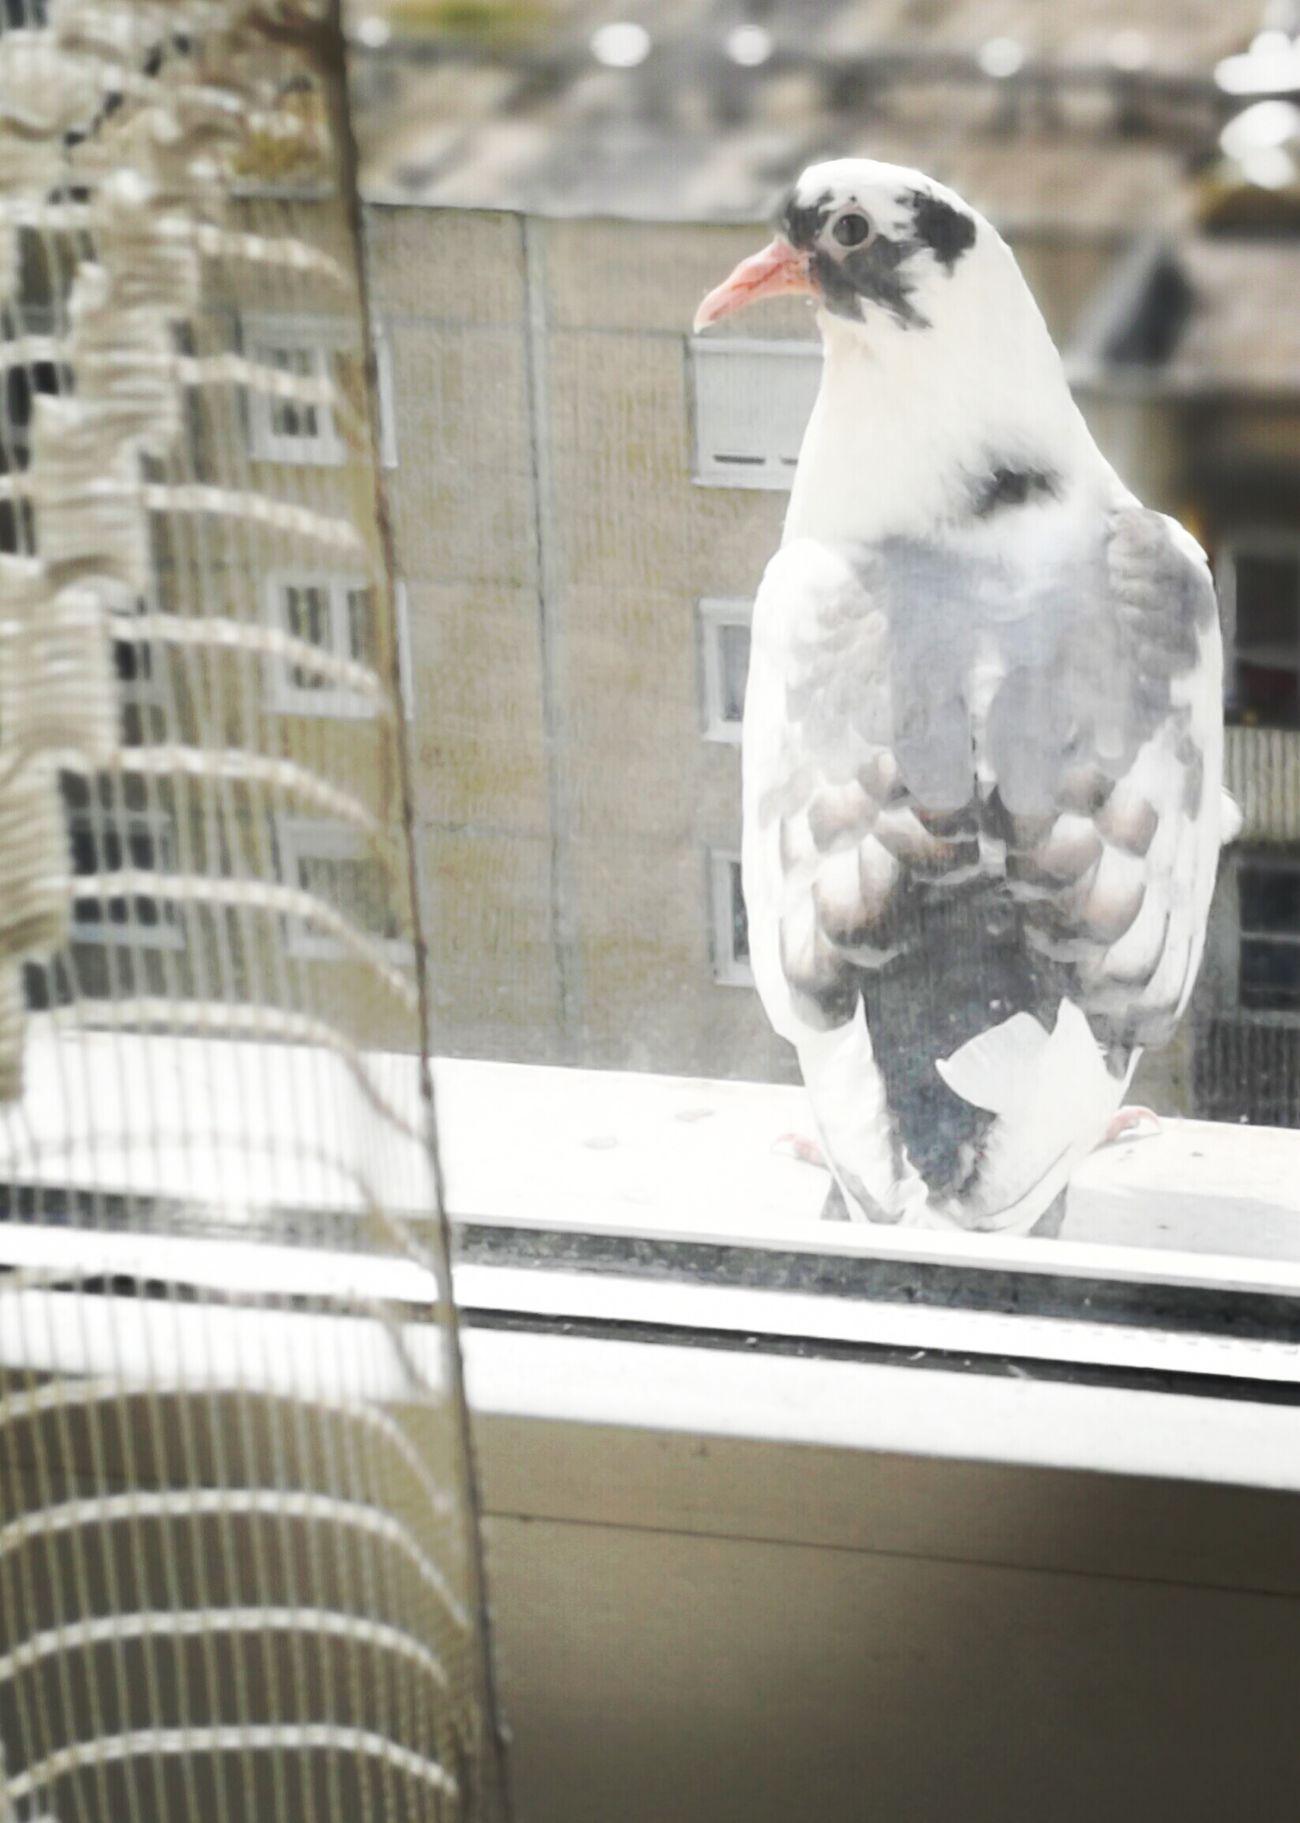 EyeEm Best Shots Pigeon Pigeon Pose Pigeon Watching Pigeonslife Feathered Beauty Animal Themes Feather  Birds Of EyeEm  Window View City Bird EyeEm Gallery